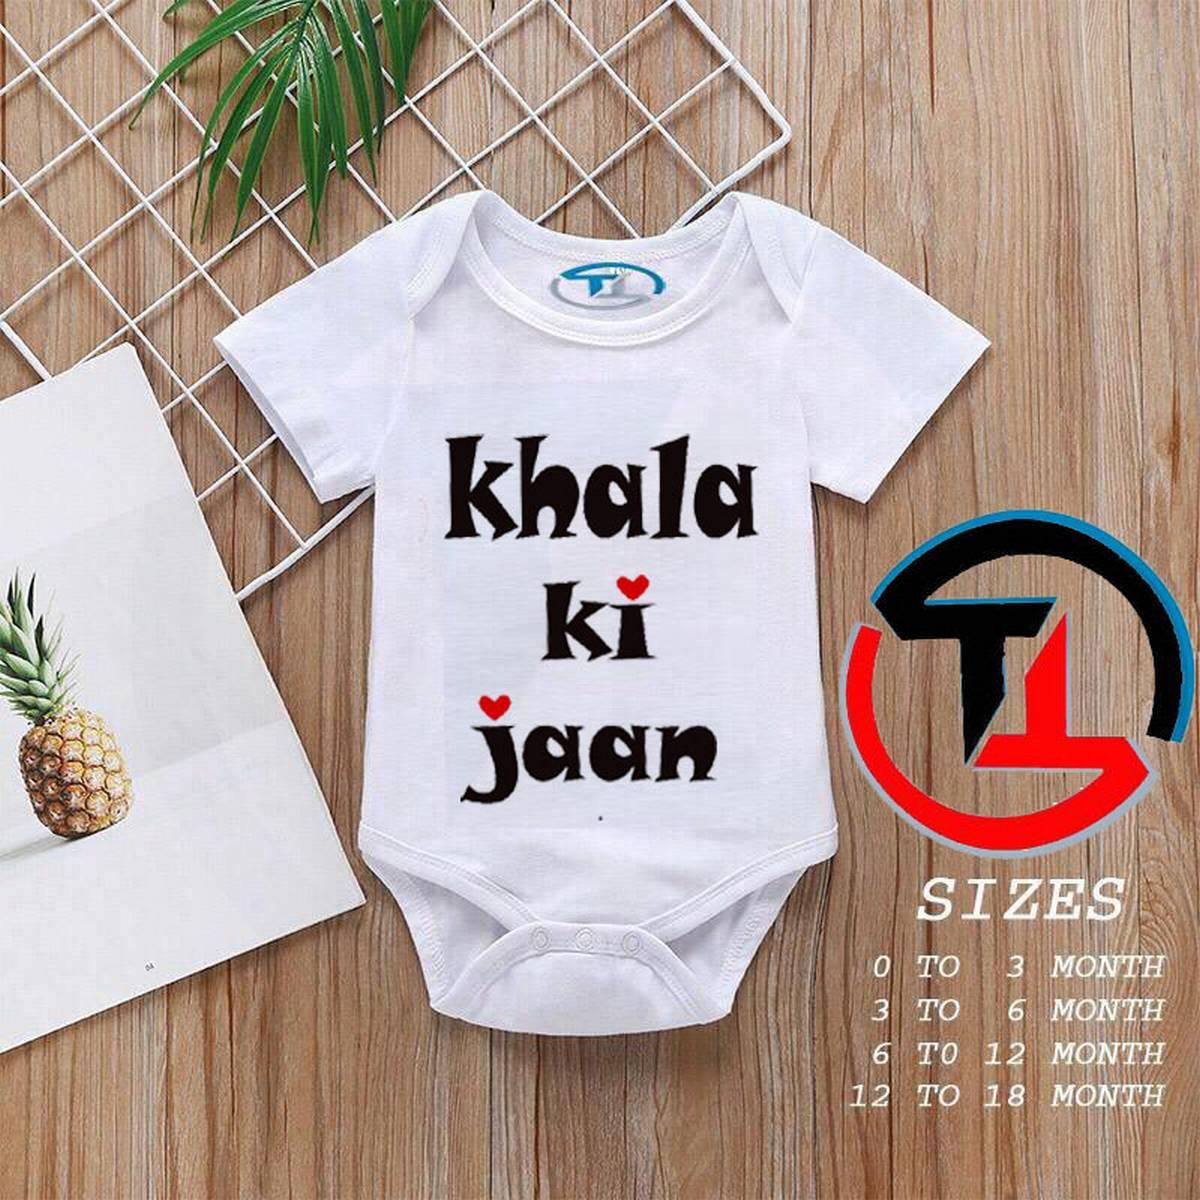 Baby Girls and Boys Half Sleeves Cotton Body suits Summer Wear, Romper Infants Onesies (KHALA KI JAN)